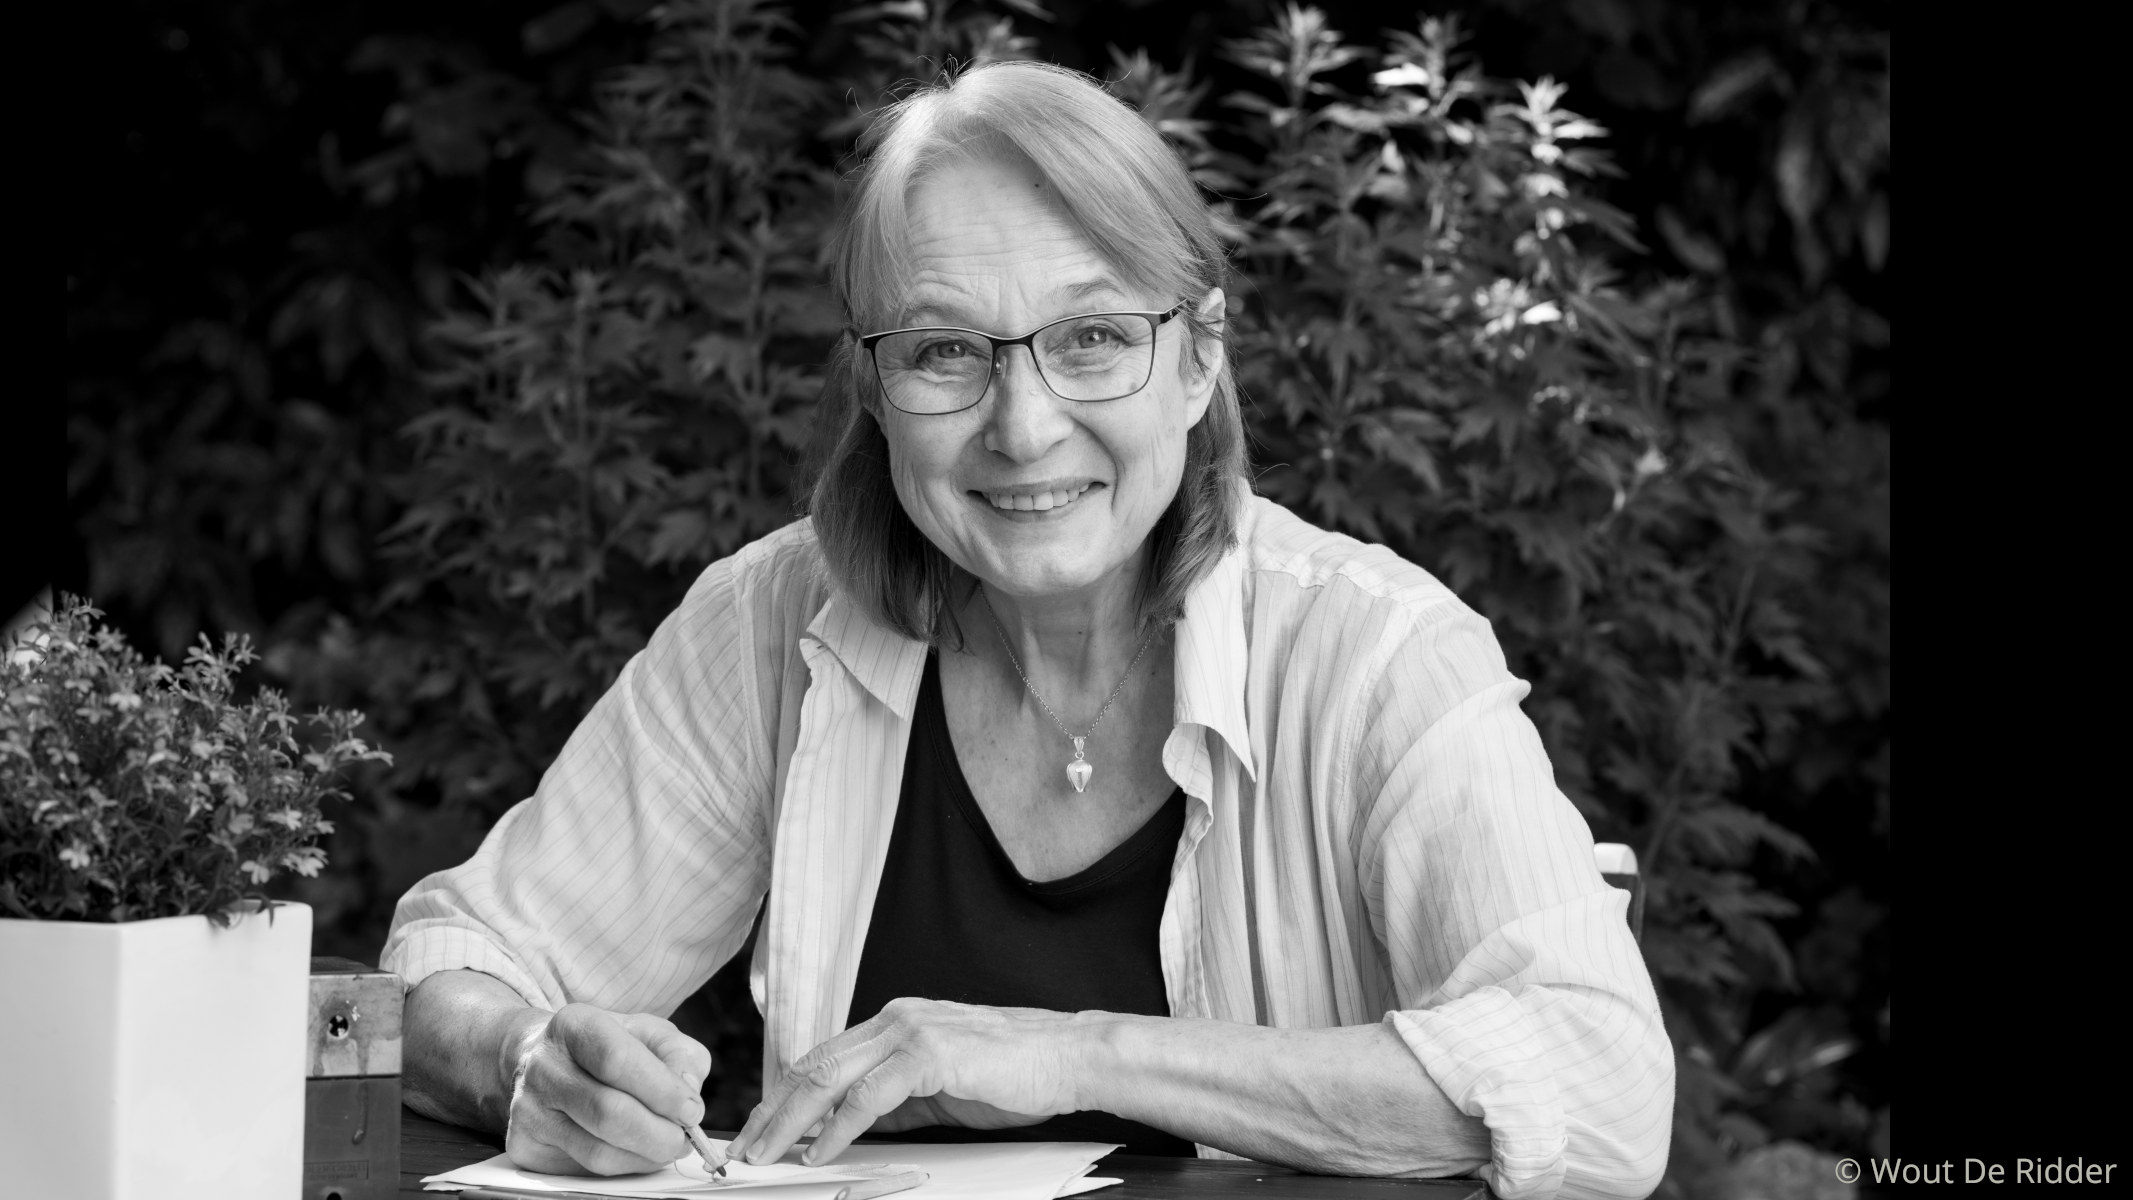 Linda van Mieghem